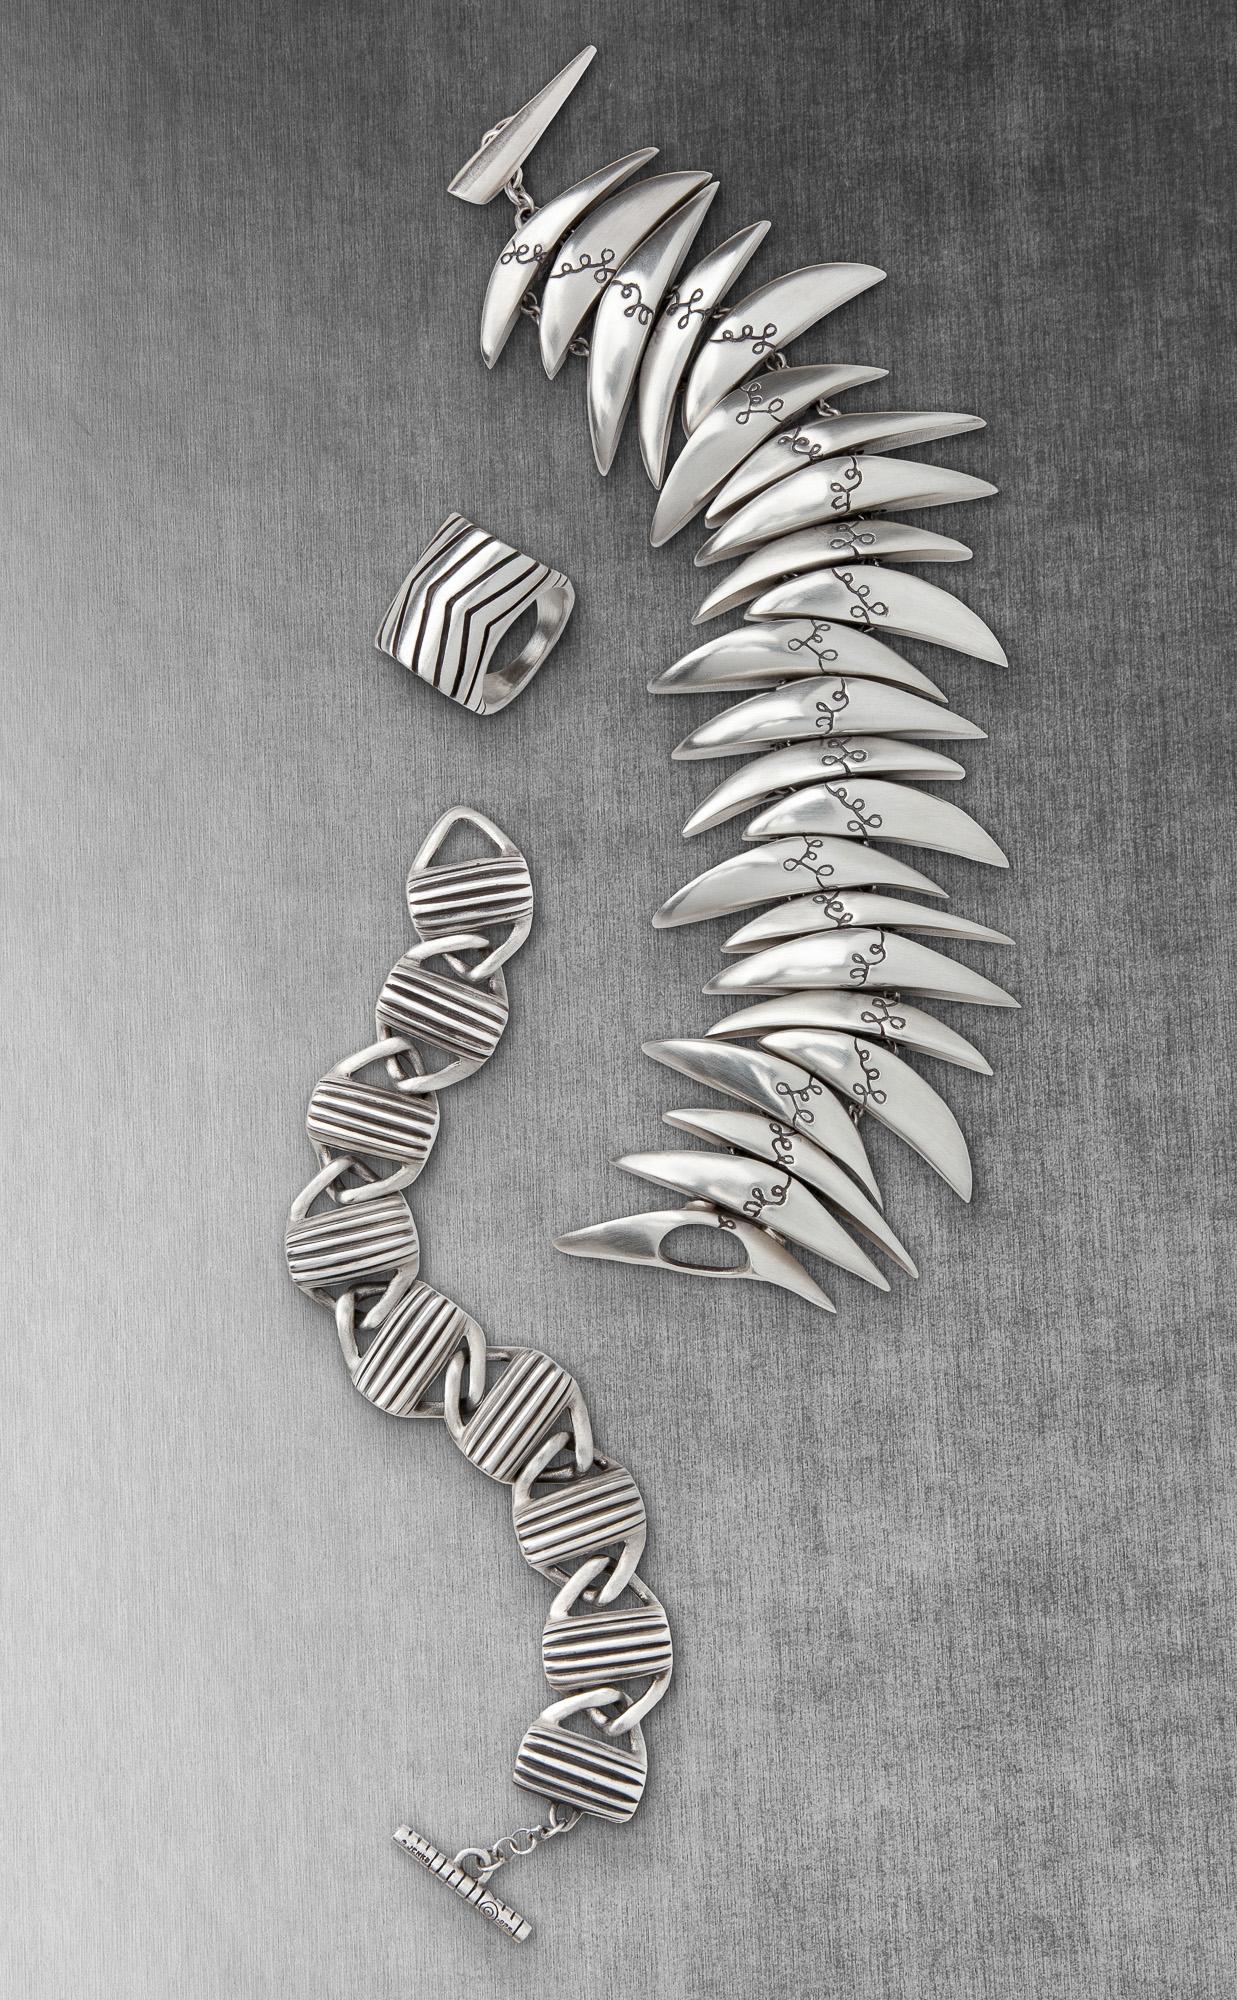 Jewelry_MG_6298 on silver v5-SQSPC_2000px-sharpHIGH.jpg